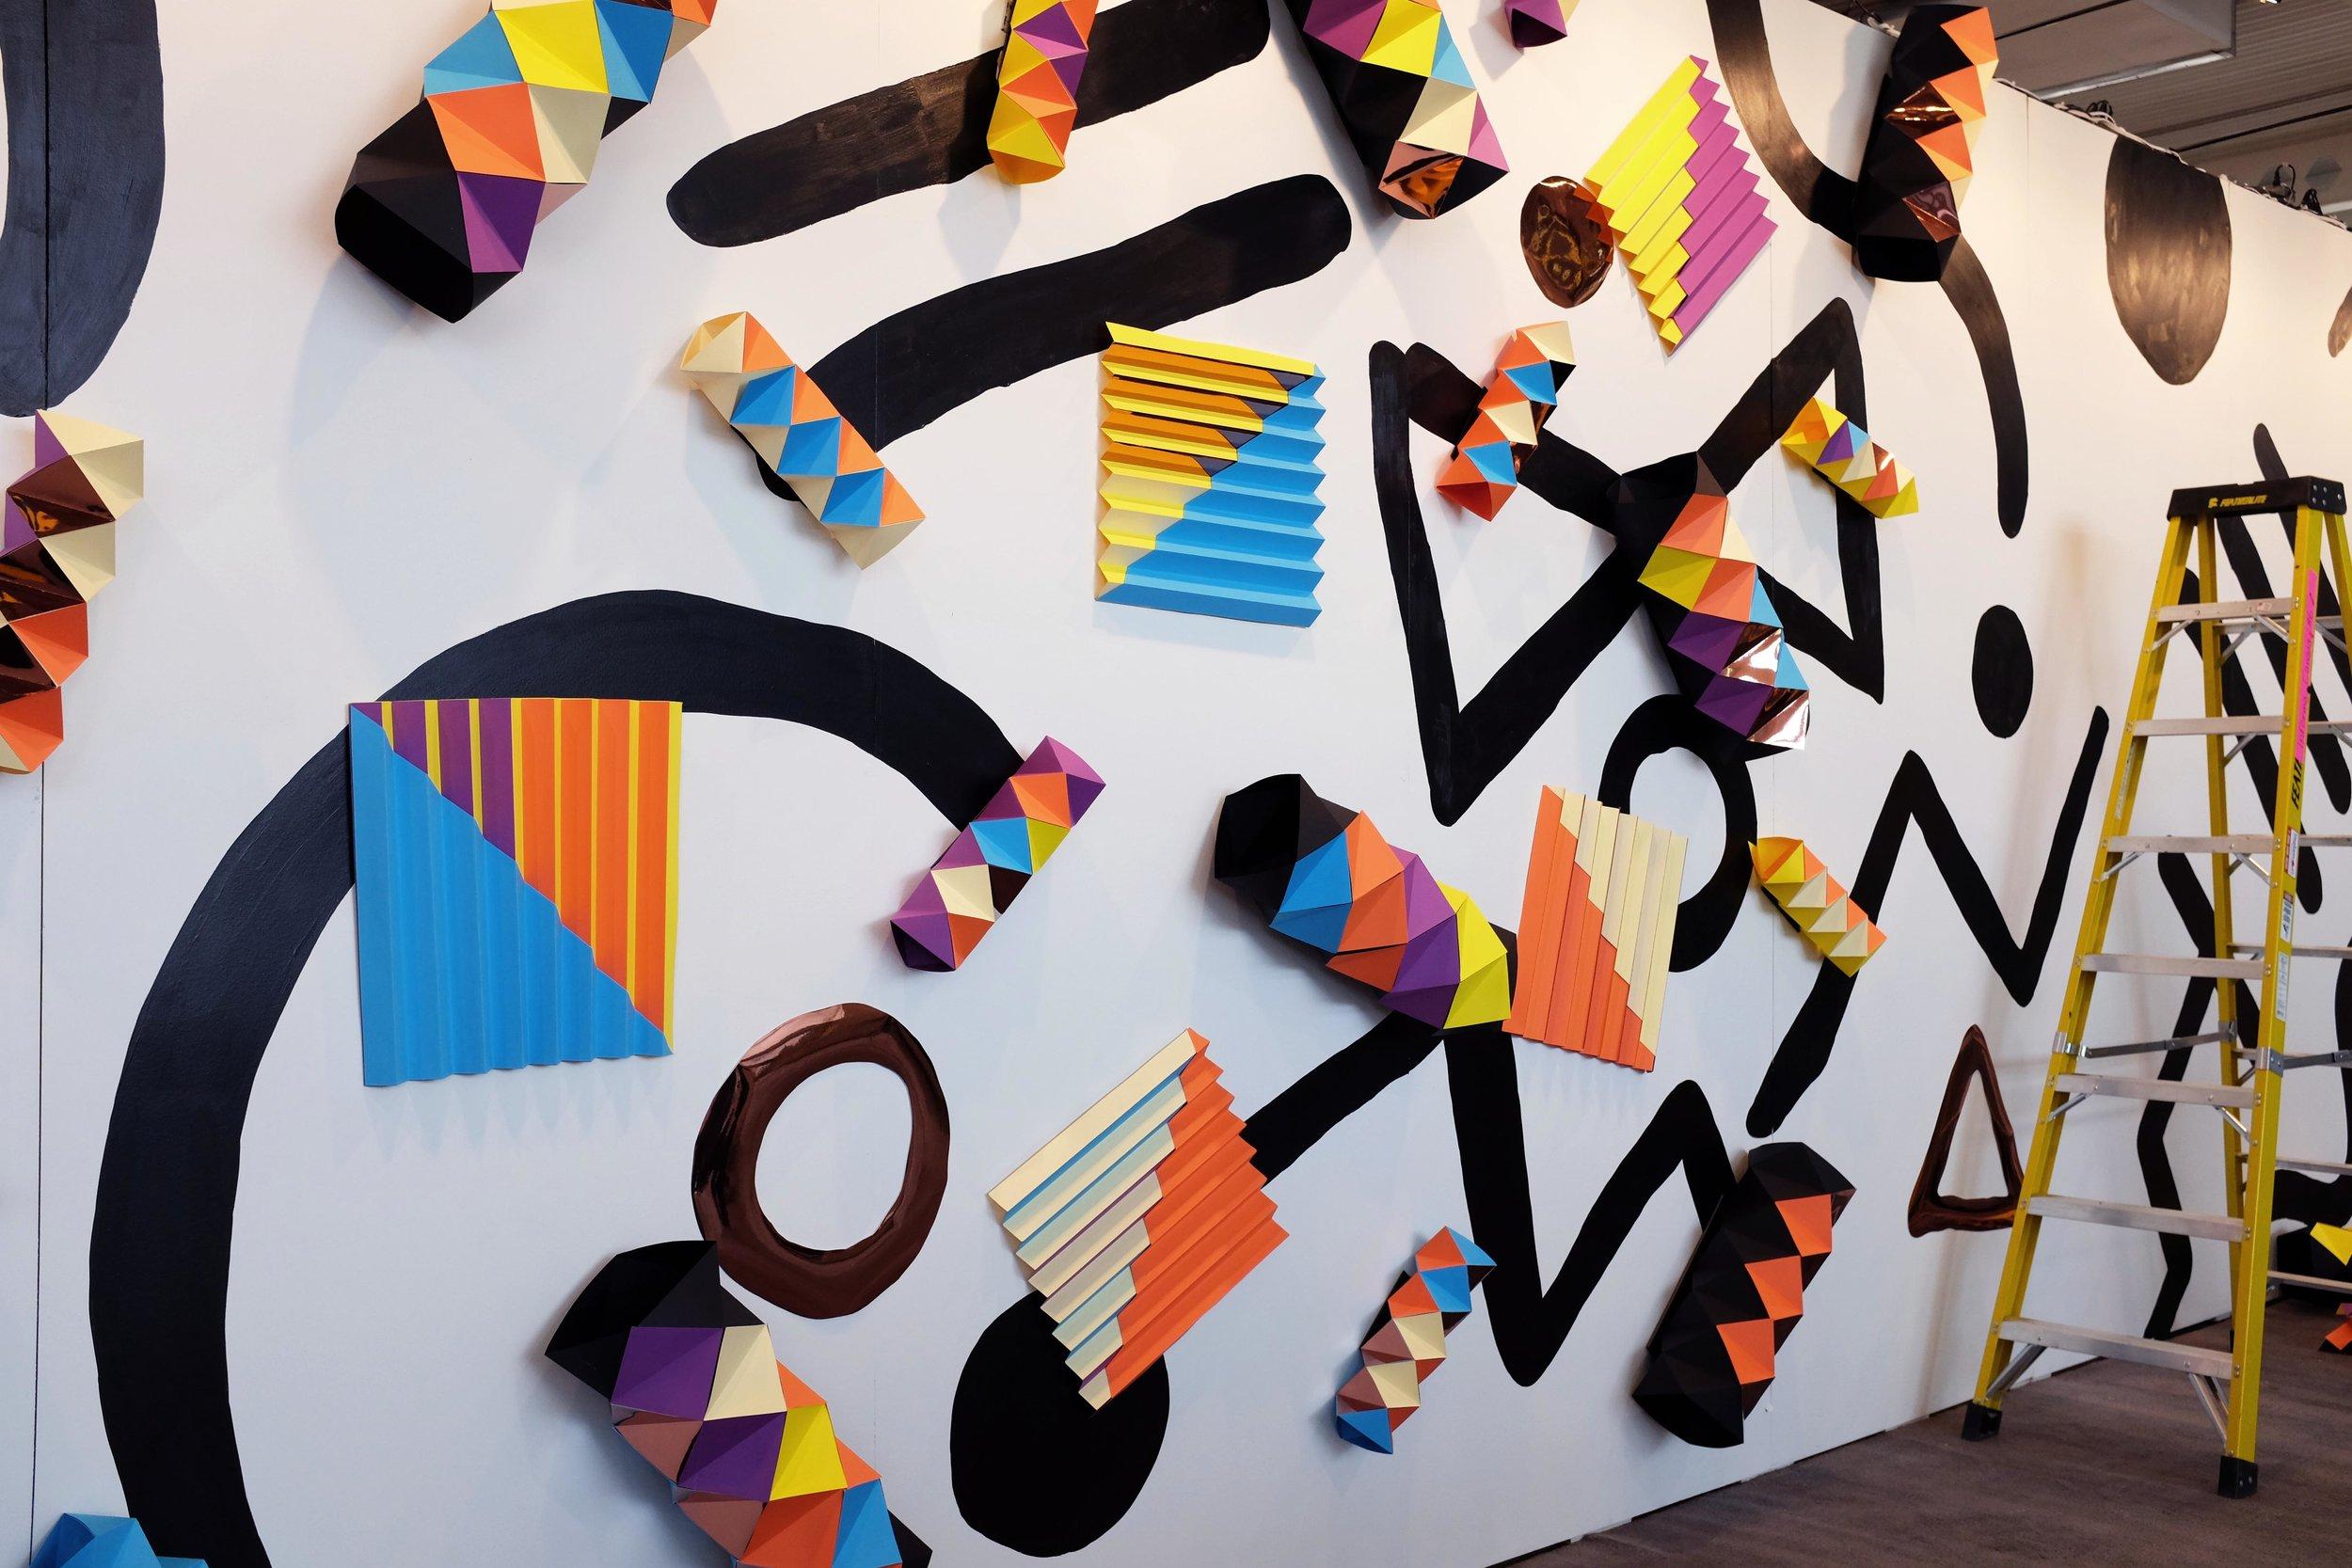 miss-cloudy-pauline-loctin-artist-project-2019-paper-art-origami-entrance-toronto-2.jpg